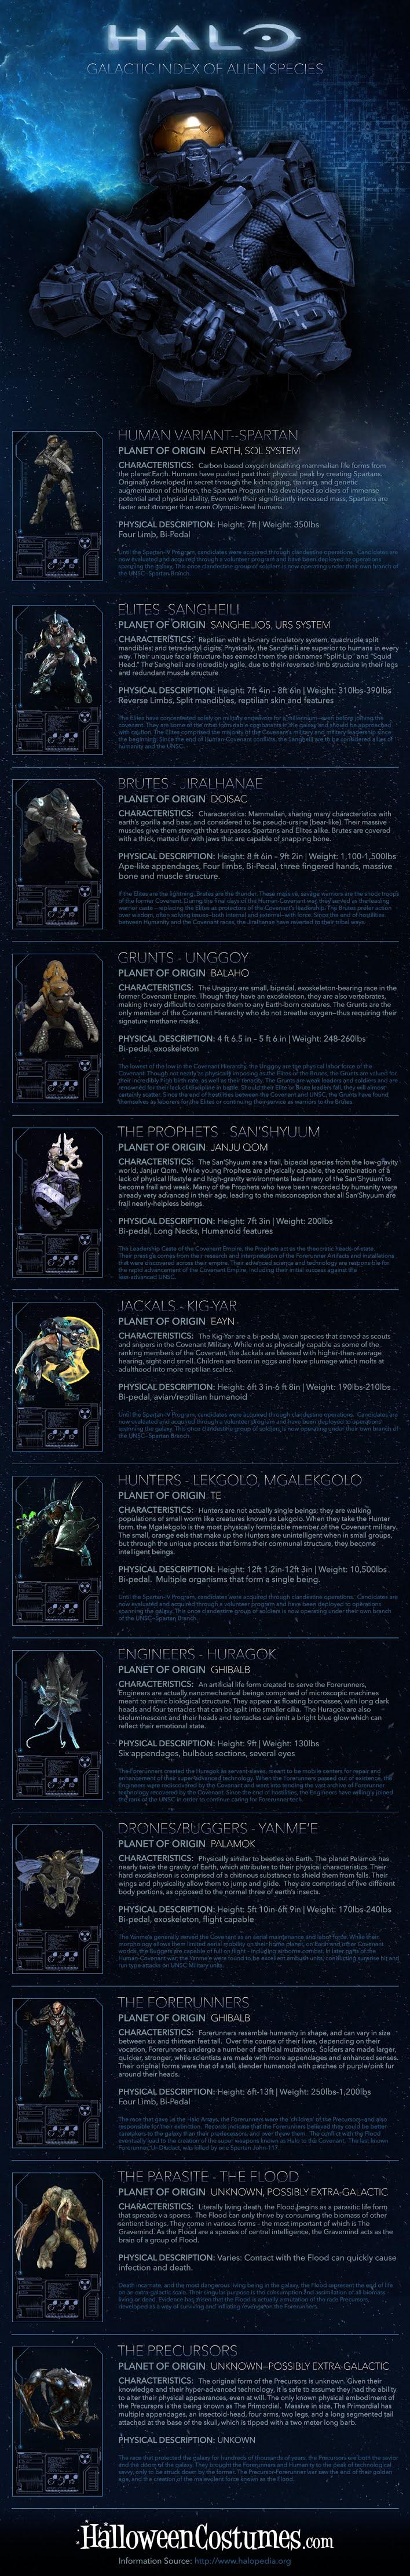 Halo Galactic Index of Alien Species #infographic